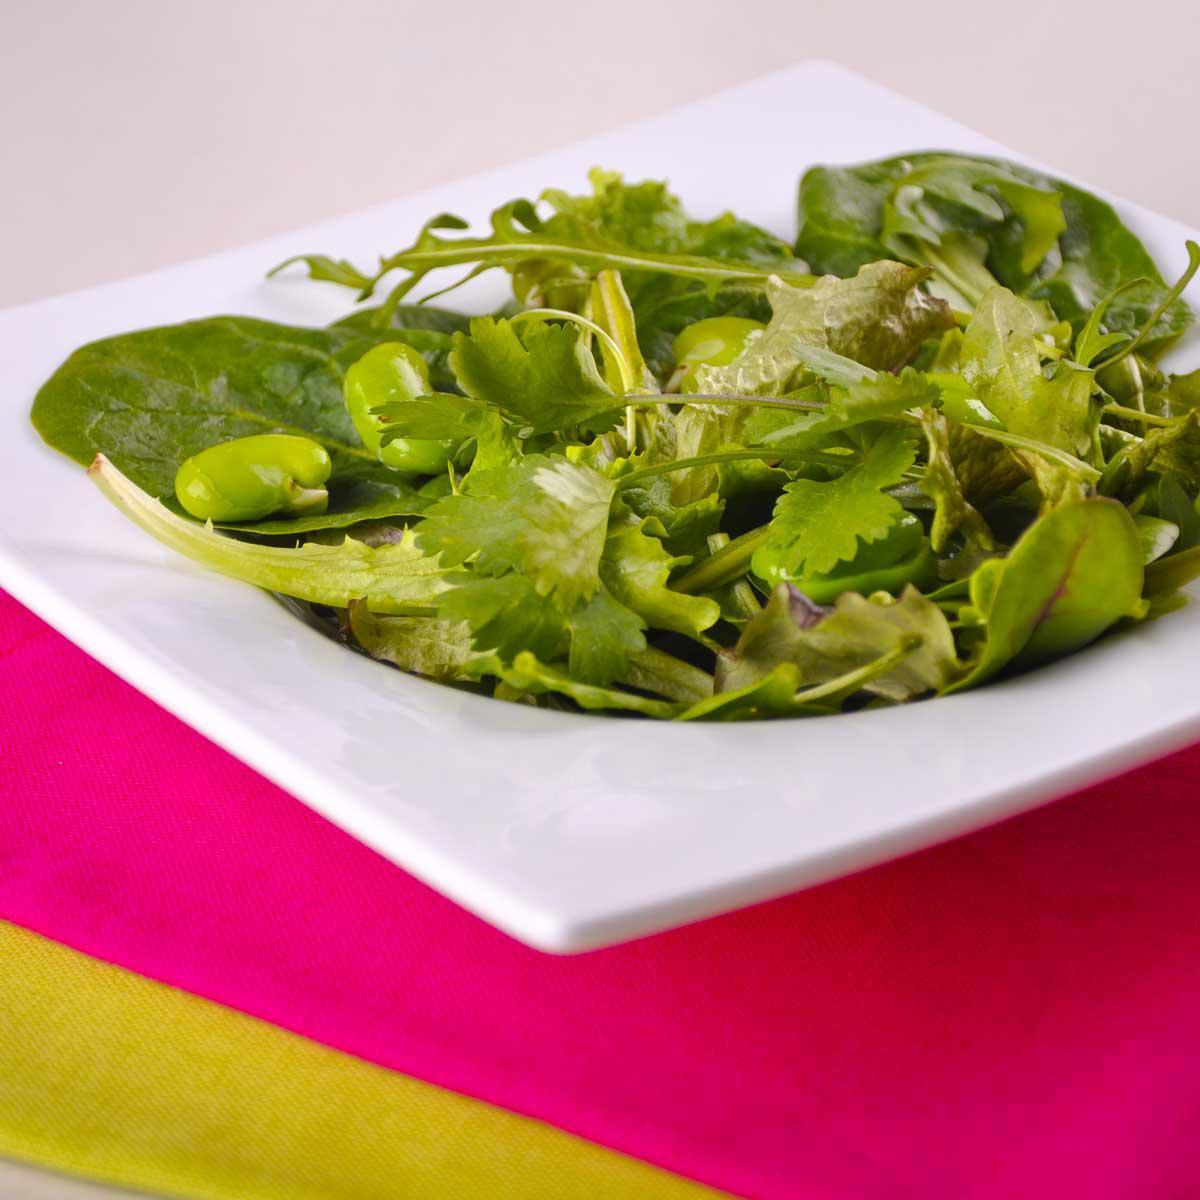 digestion salade difficile